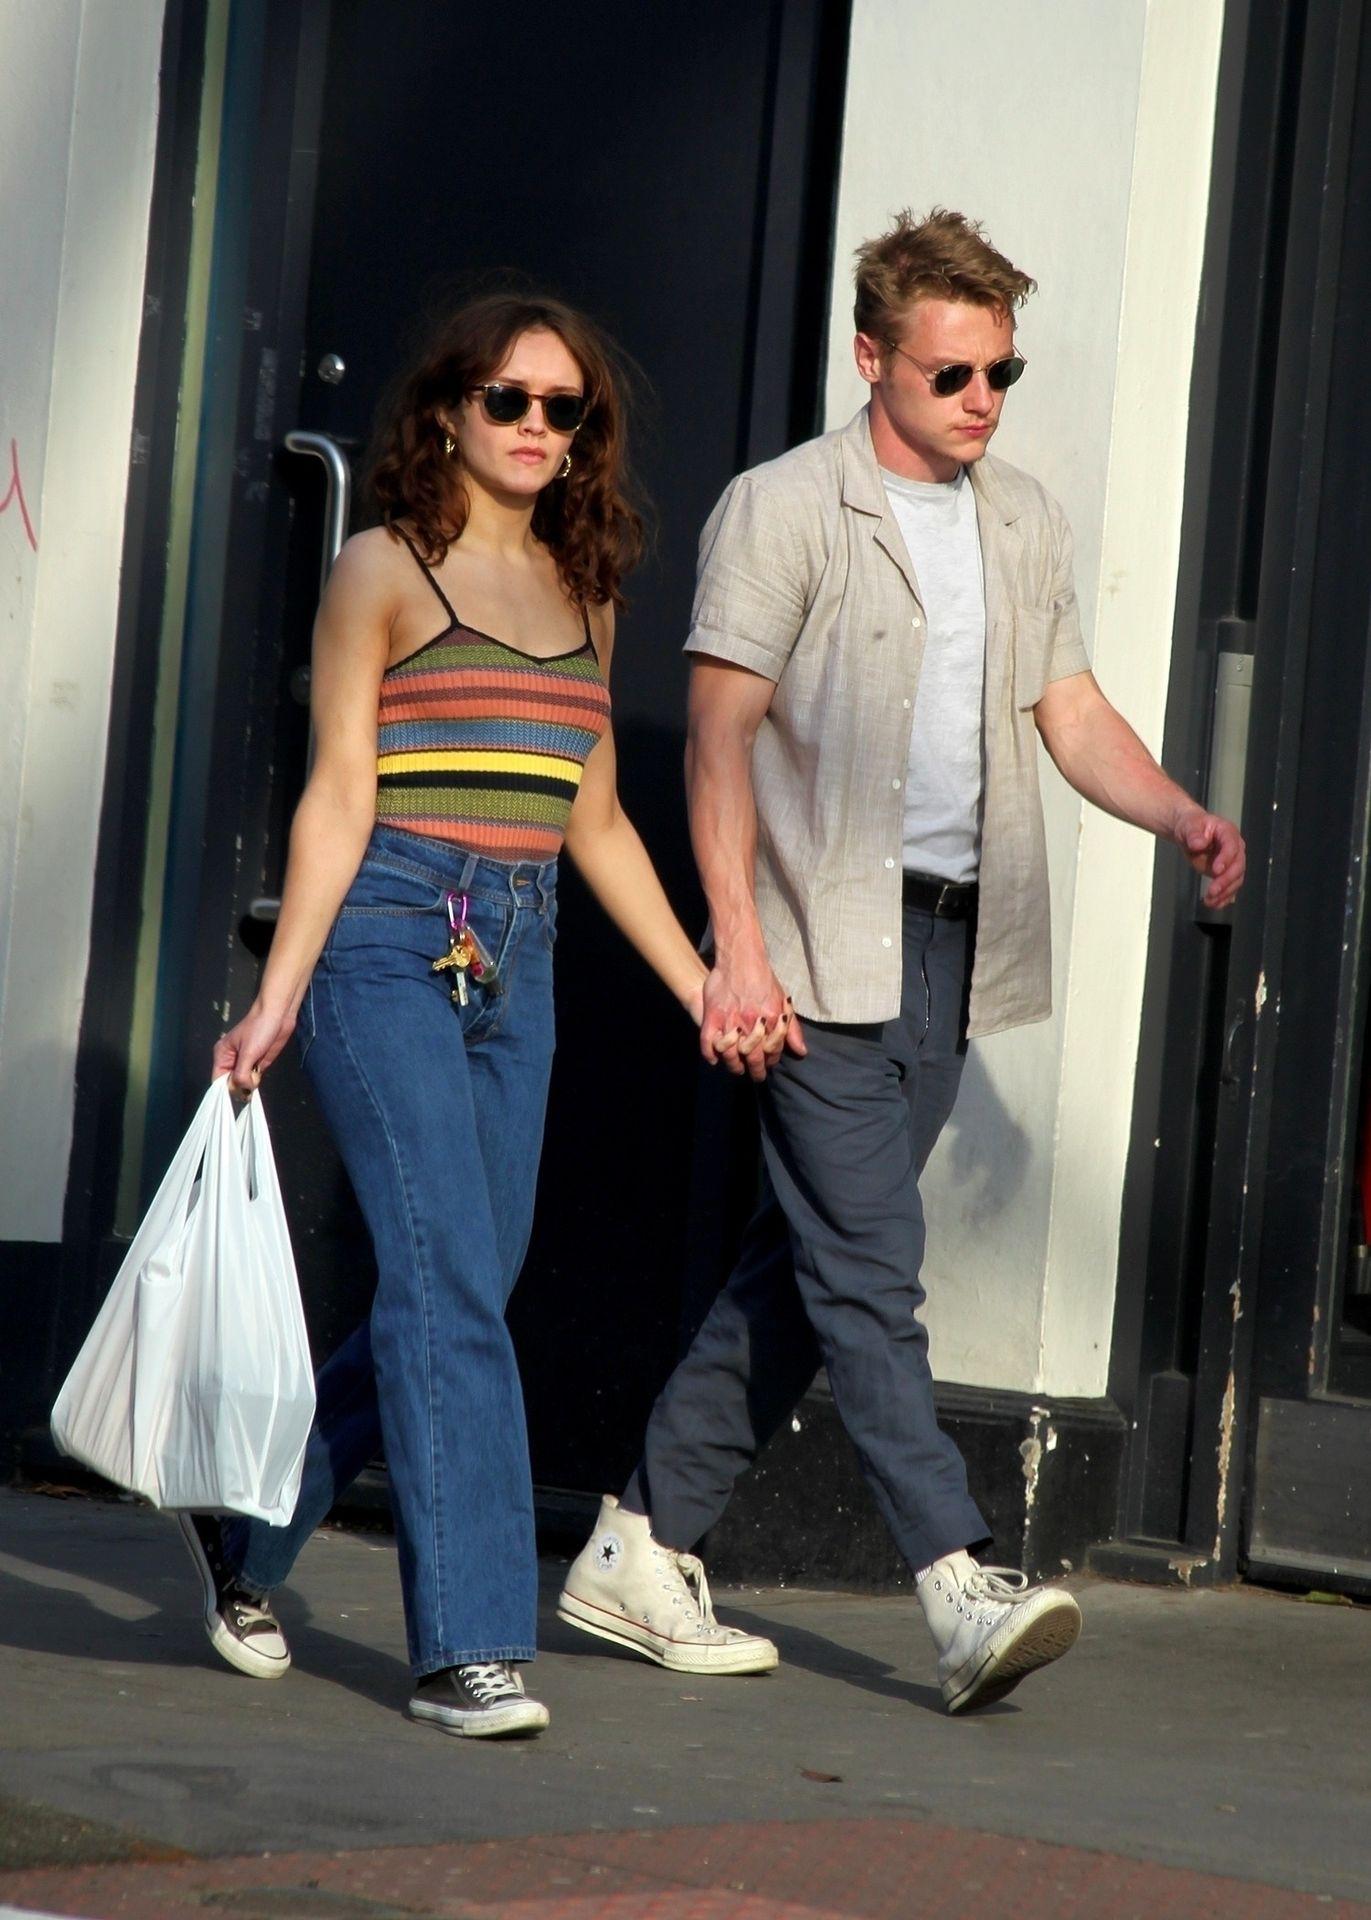 Ben Hardy Walks Hand In Hand With Actress Girlfriend Olivia Cooke 0001